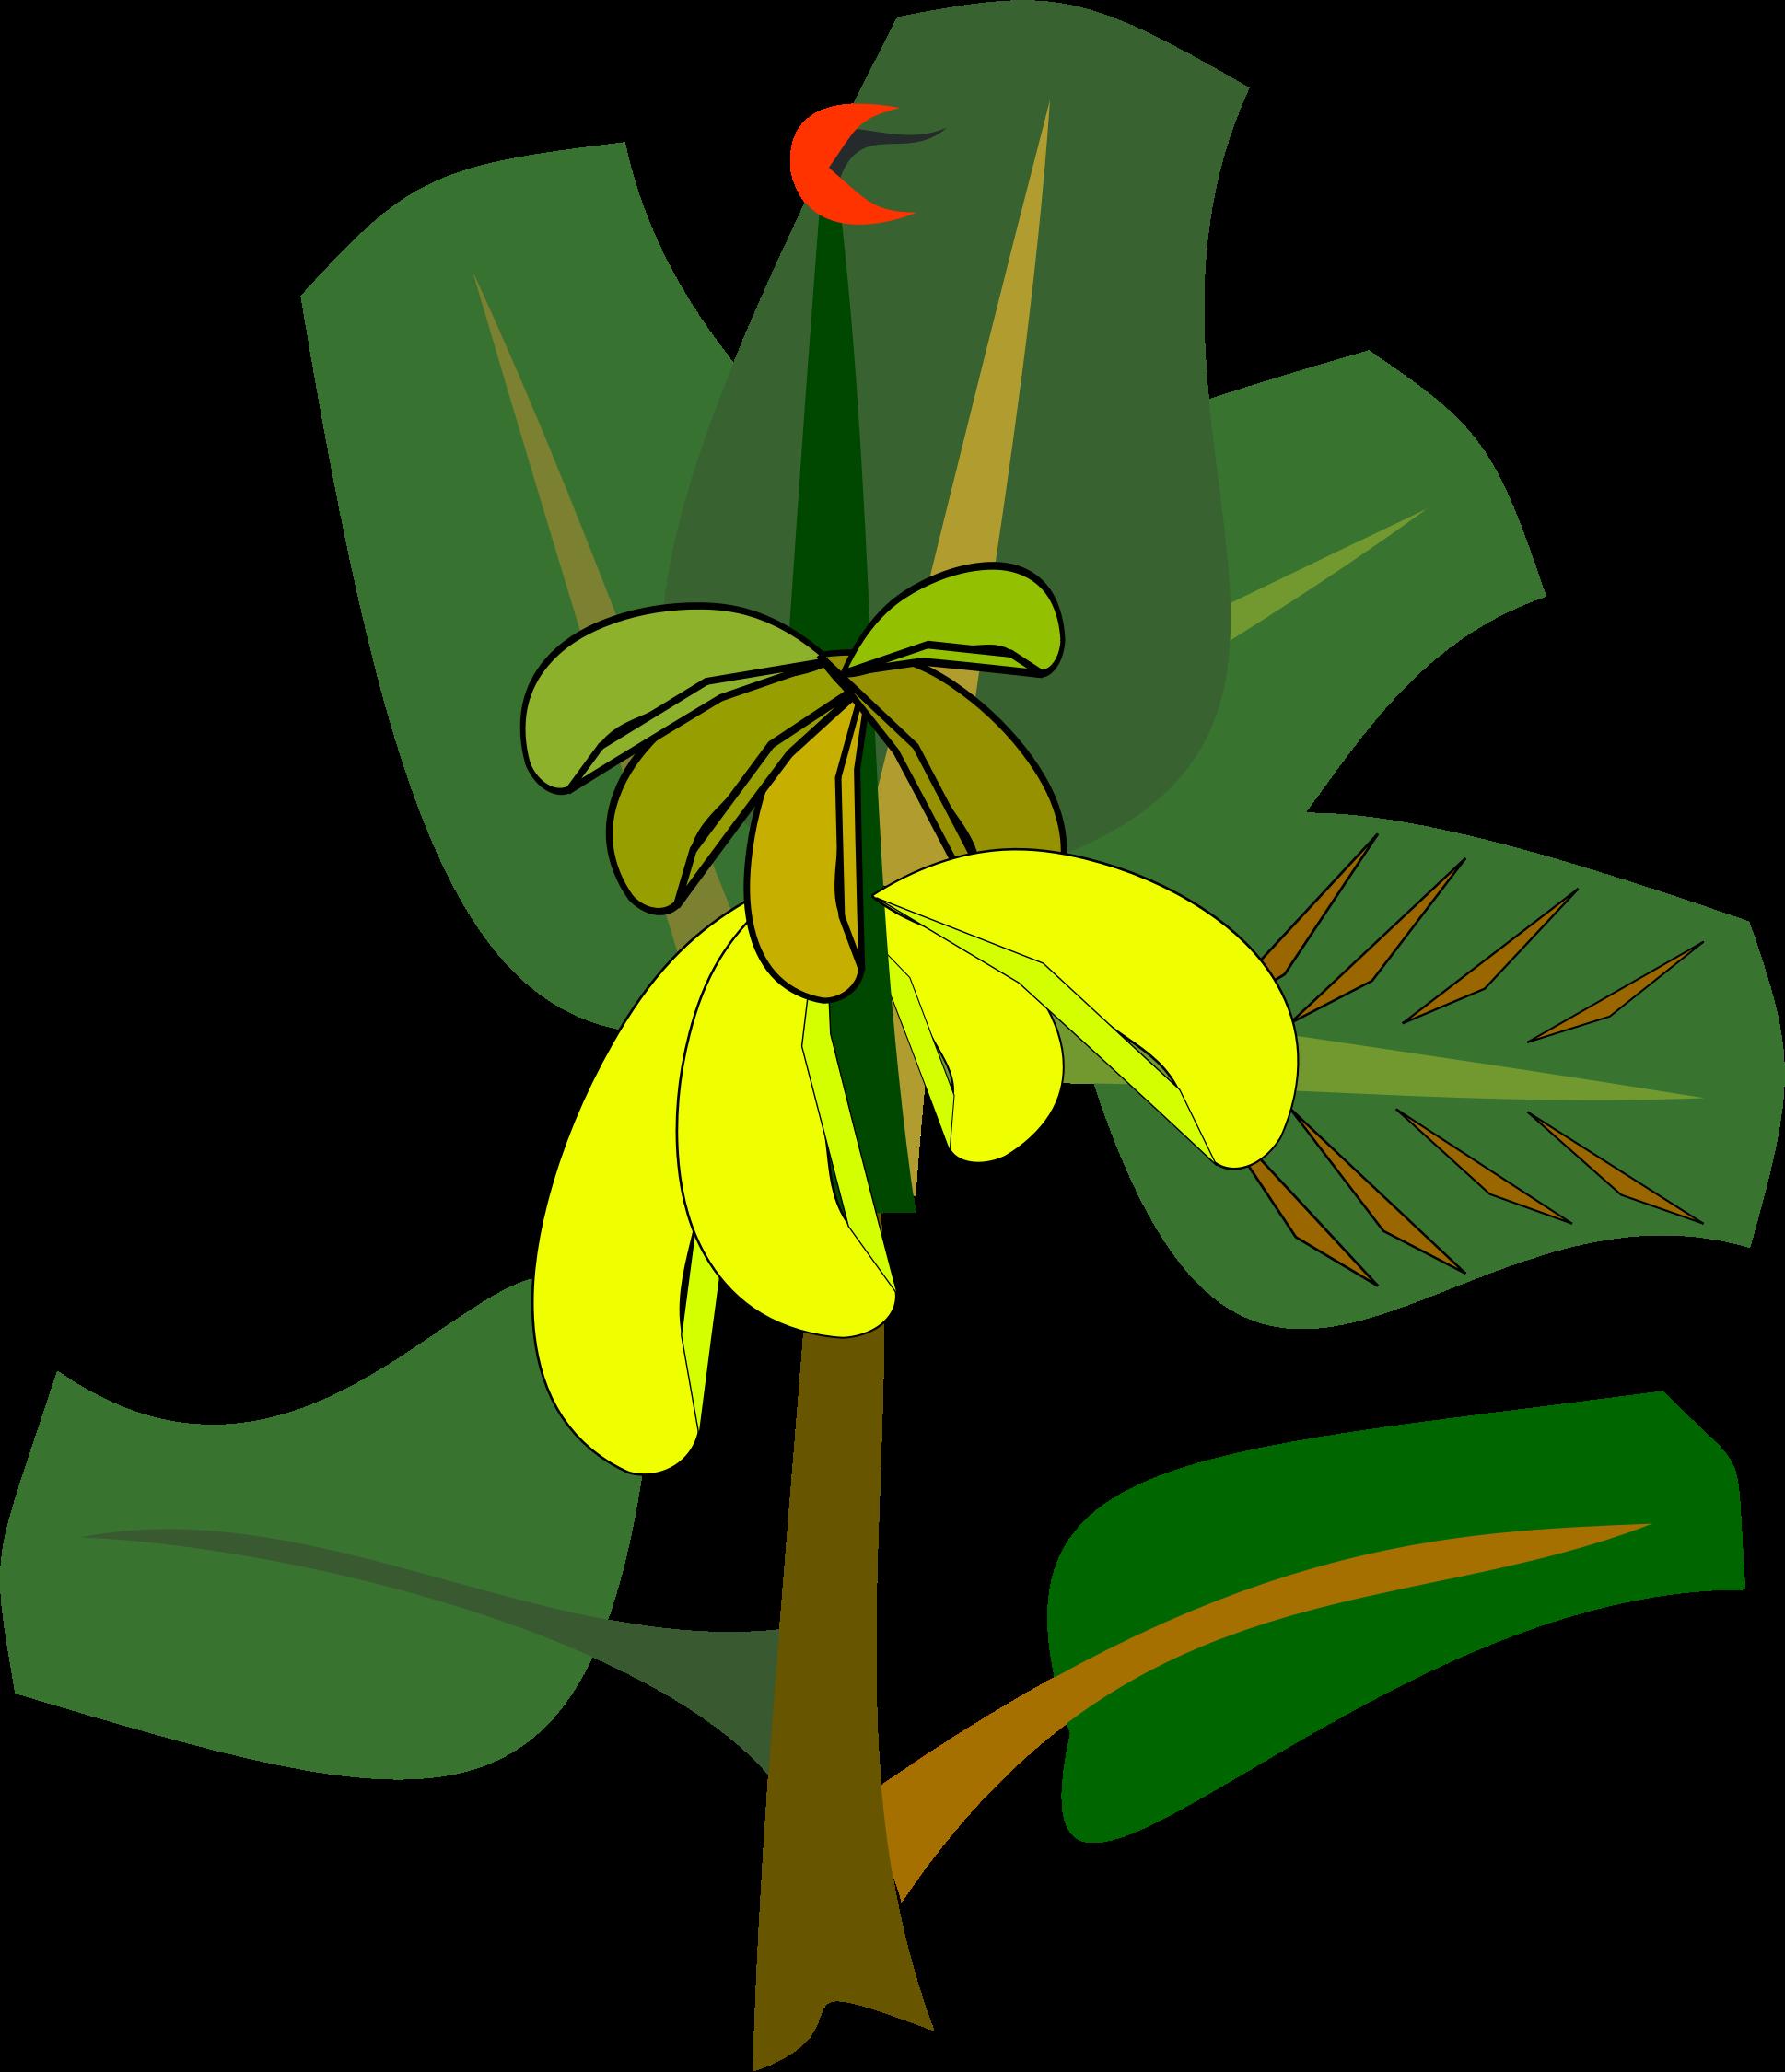 Bananas on the big. Clipart tree banana